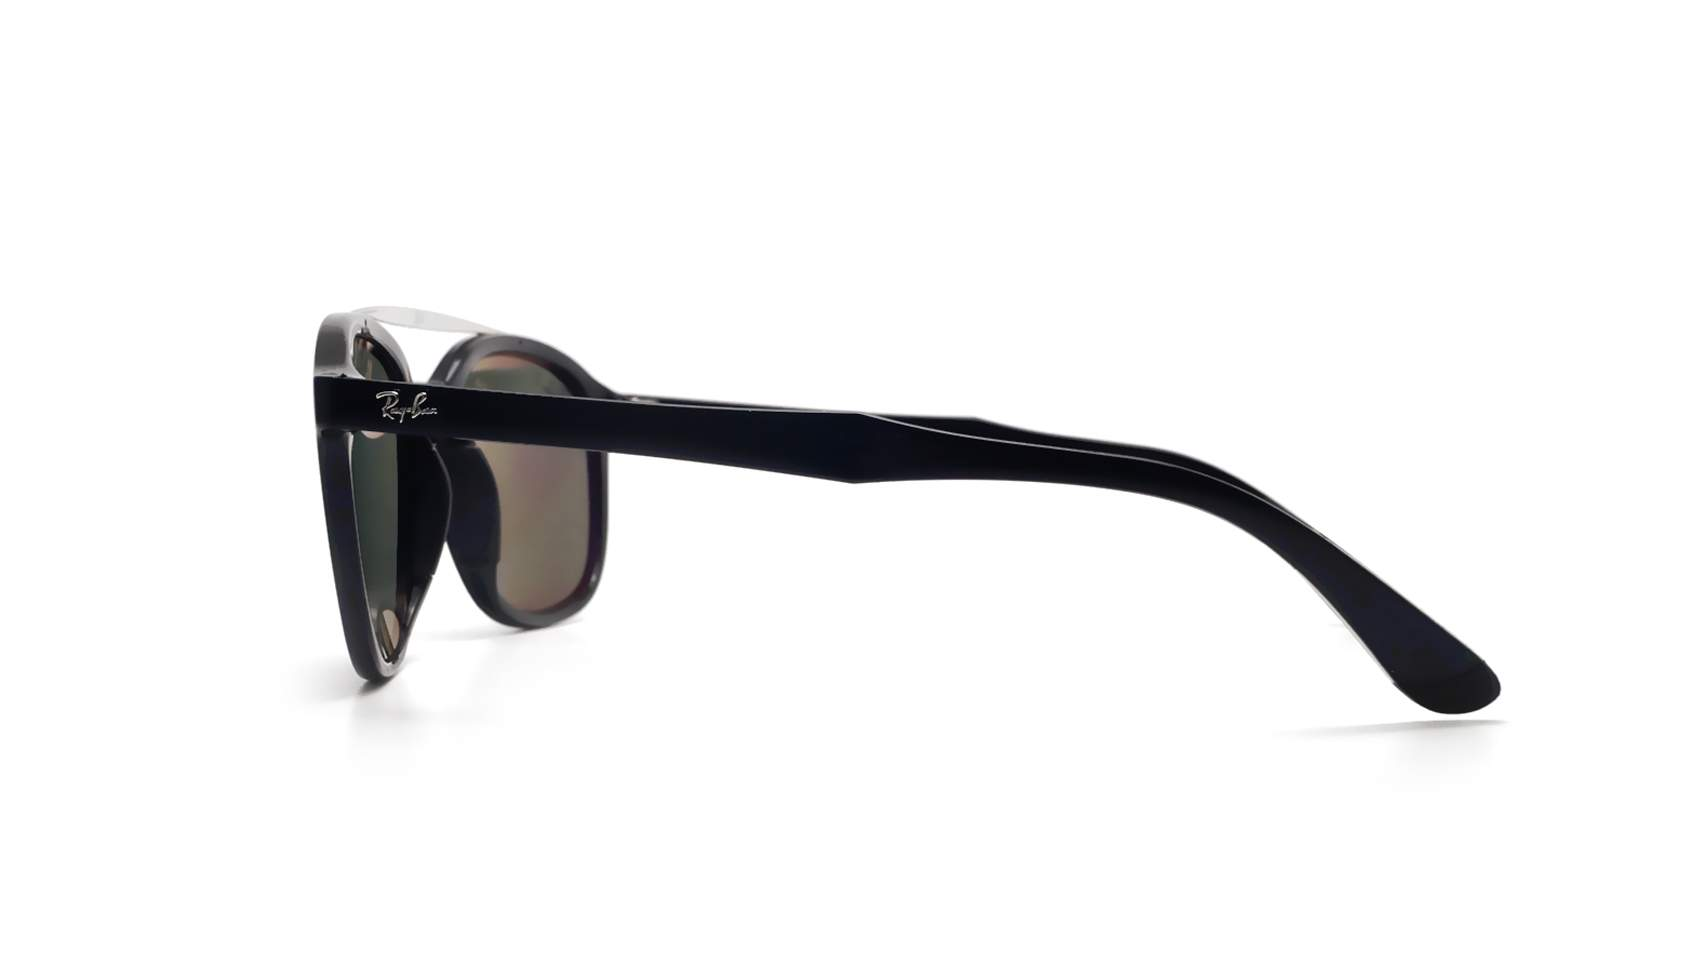 628681d753 Sunglasses Ray-Ban RB4290 601 9A 53-21 Black Large Polarized